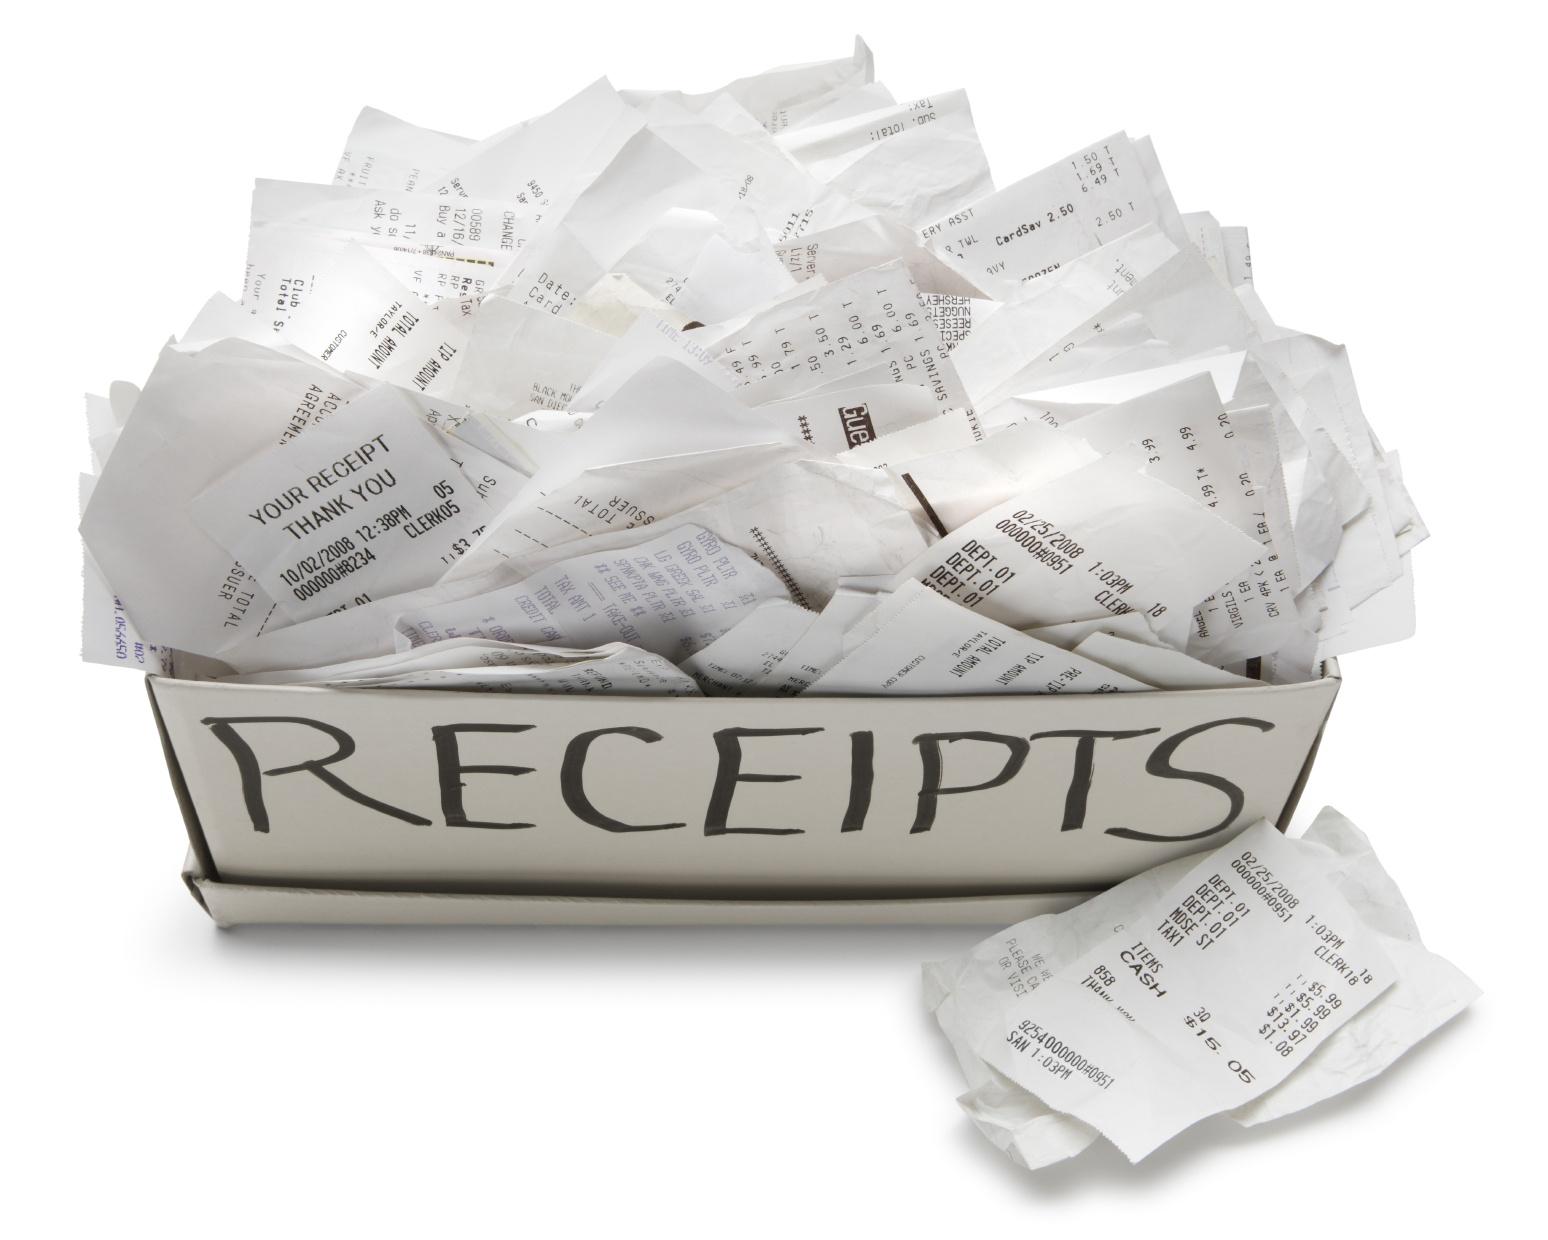 Receipts Everywhere?